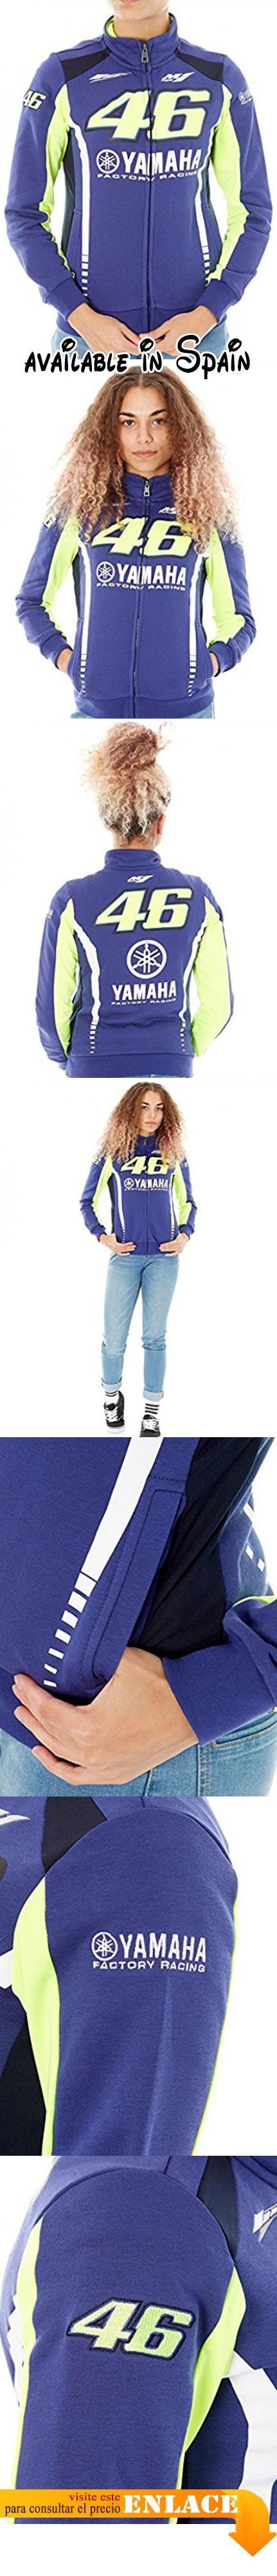 B071ZQYPLM : Jersey Con Cremallera Para Mujer Valentino Rossi Yamaha Racing Line Azul (Xs  Azul).